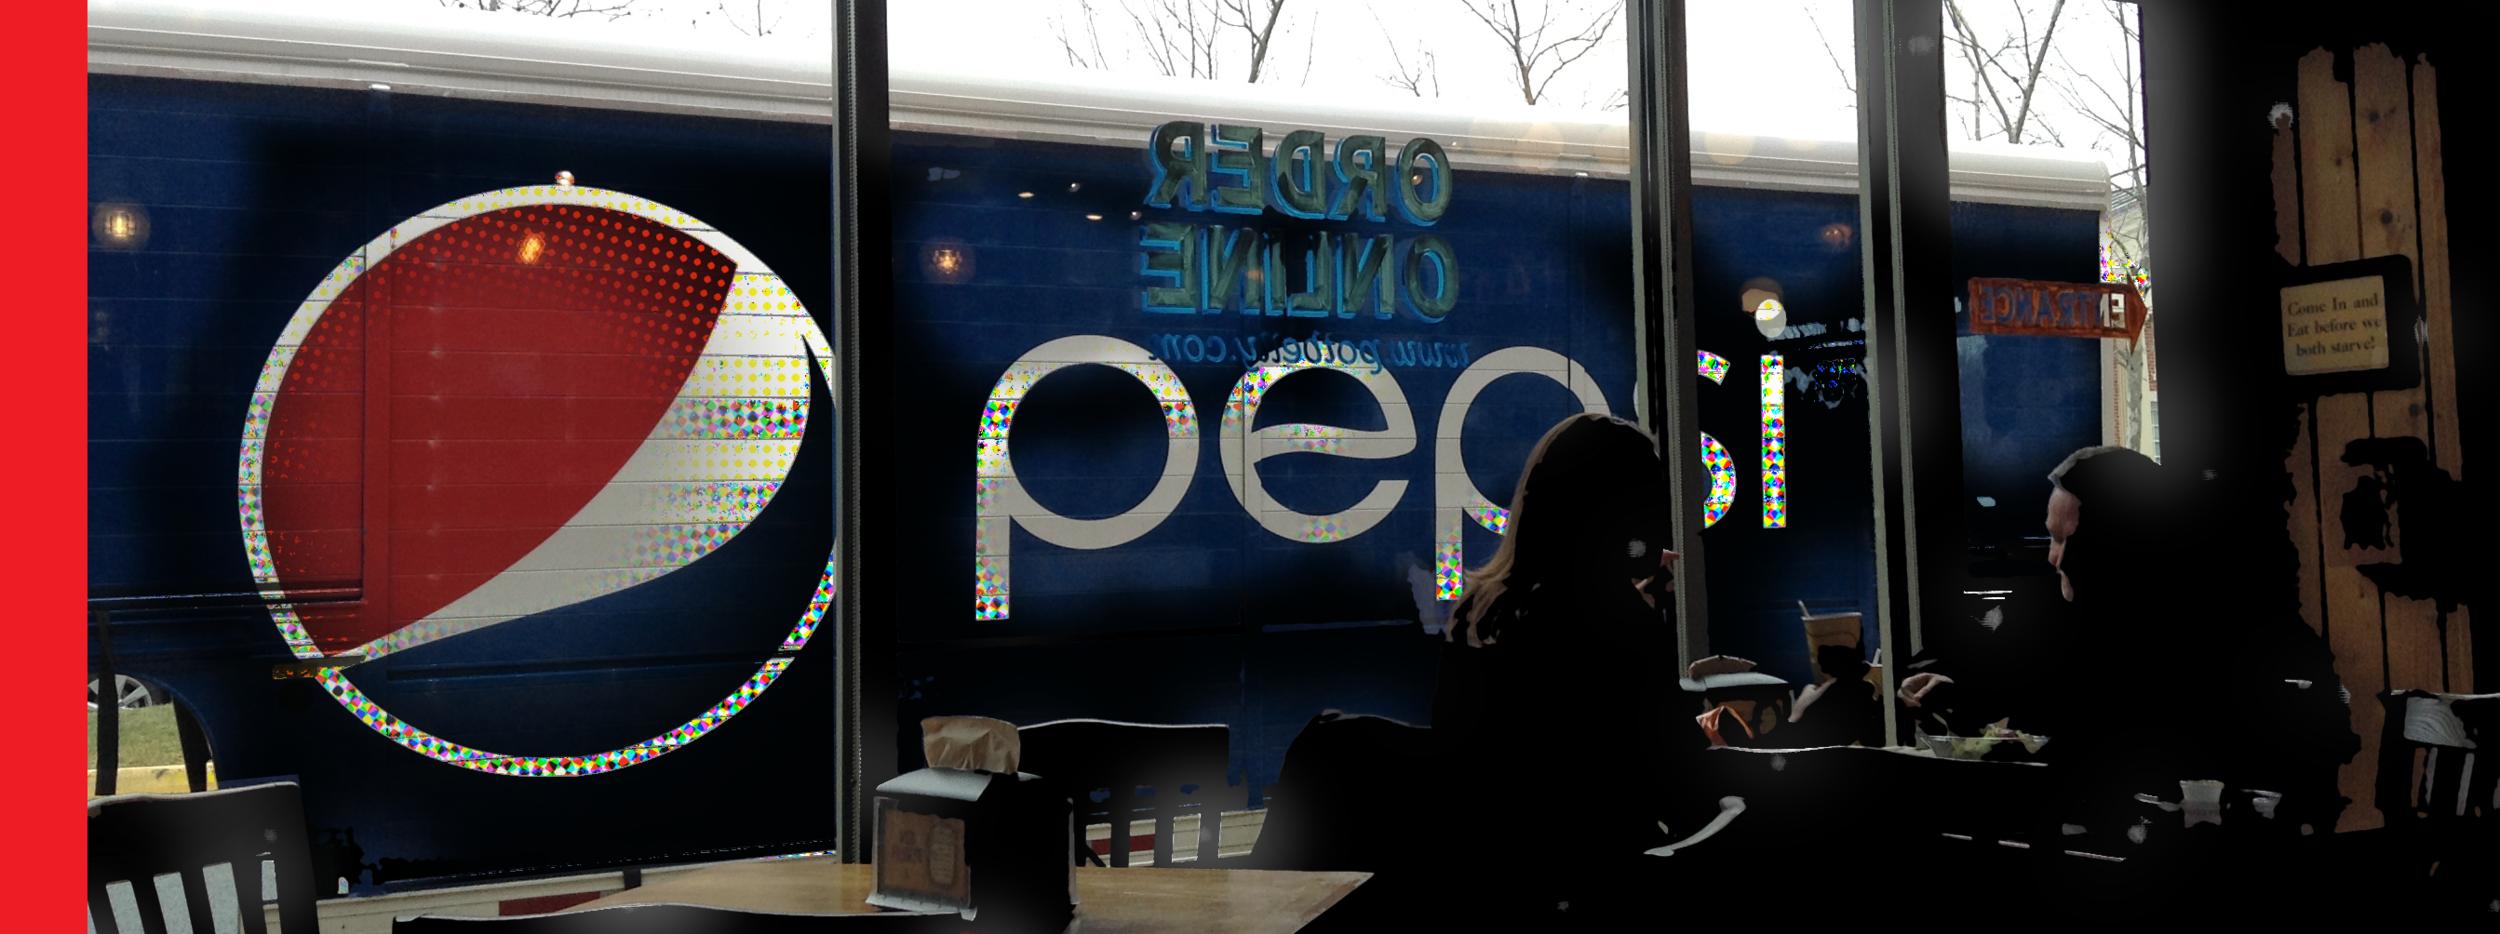 Pepsi Truck PNG v3 Narrow.png